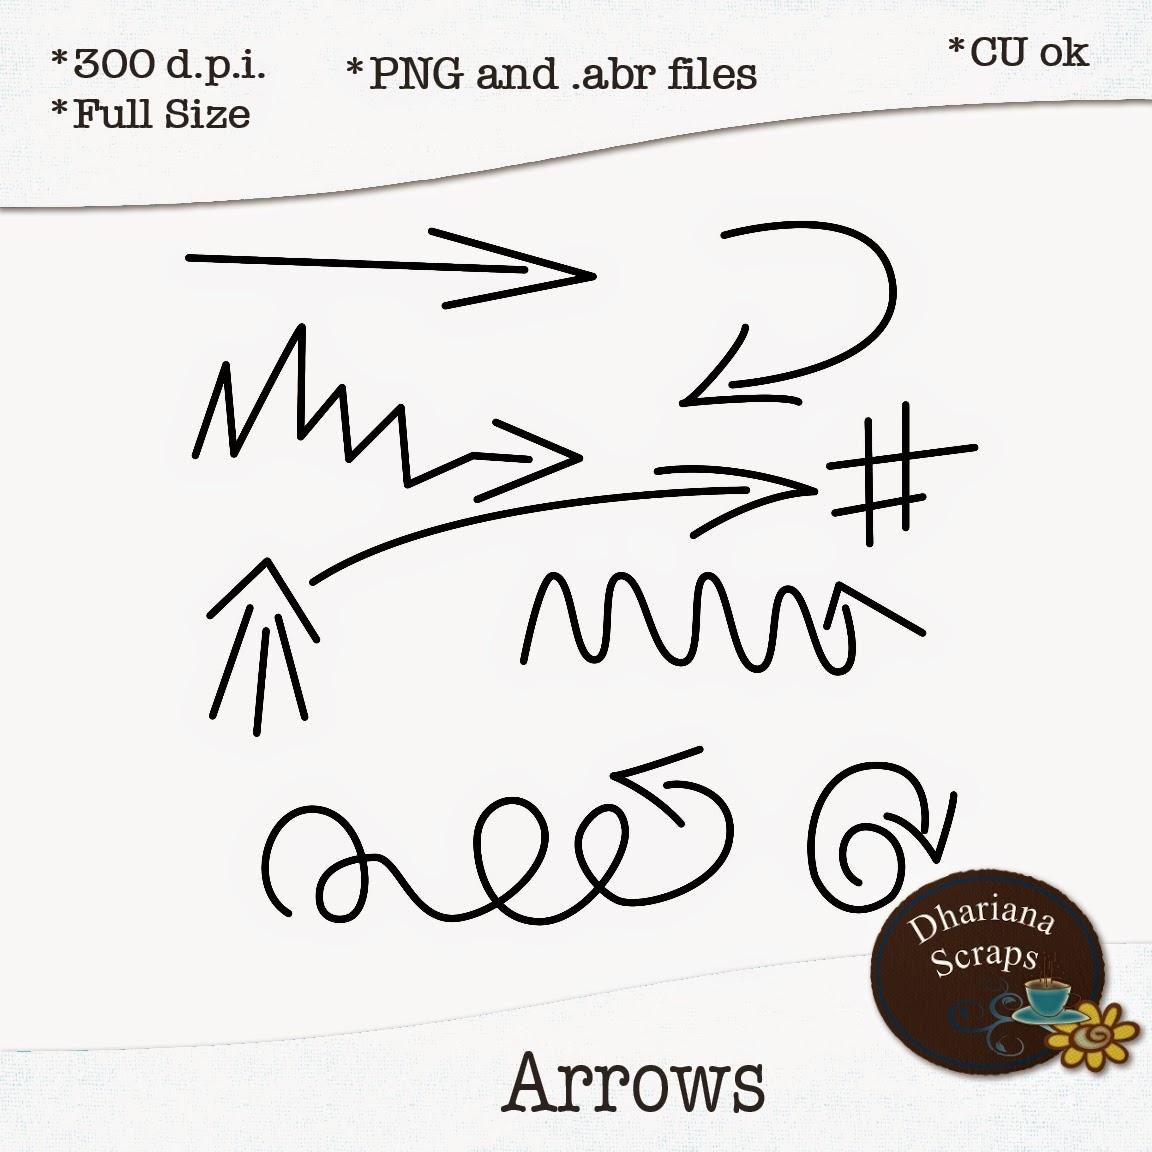 http://3.bp.blogspot.com/-q-T7jKEtQg8/VDmK7A68tmI/AAAAAAAABQg/tiPzanLiEyI/s1600/dhariana_arrows_preview.jpg